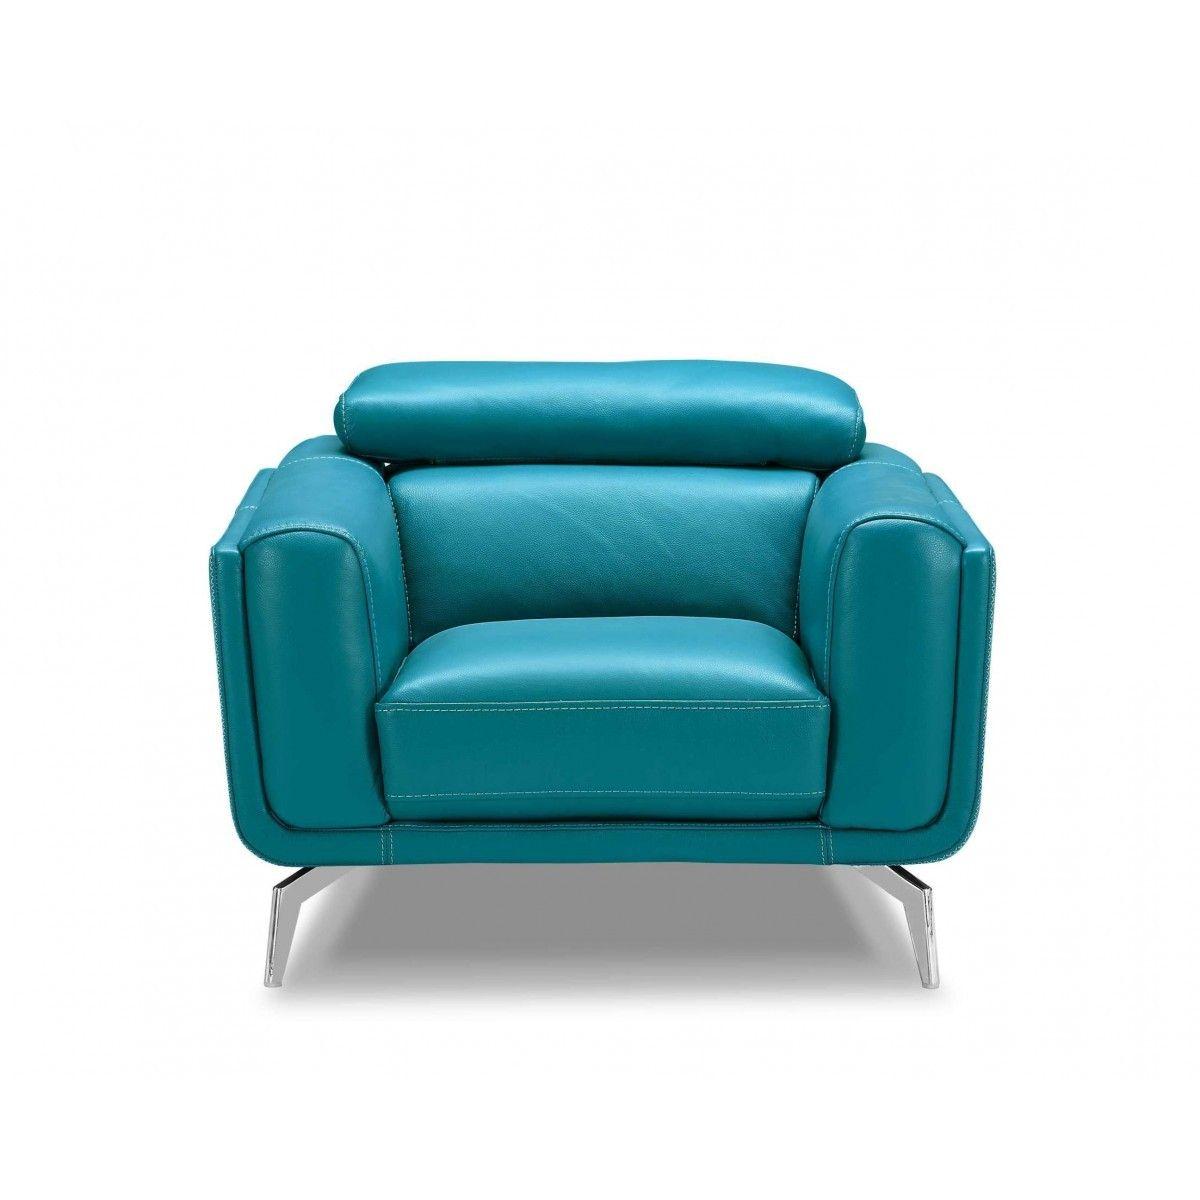 Blau Leder Stuhl   Stühle   Pinterest